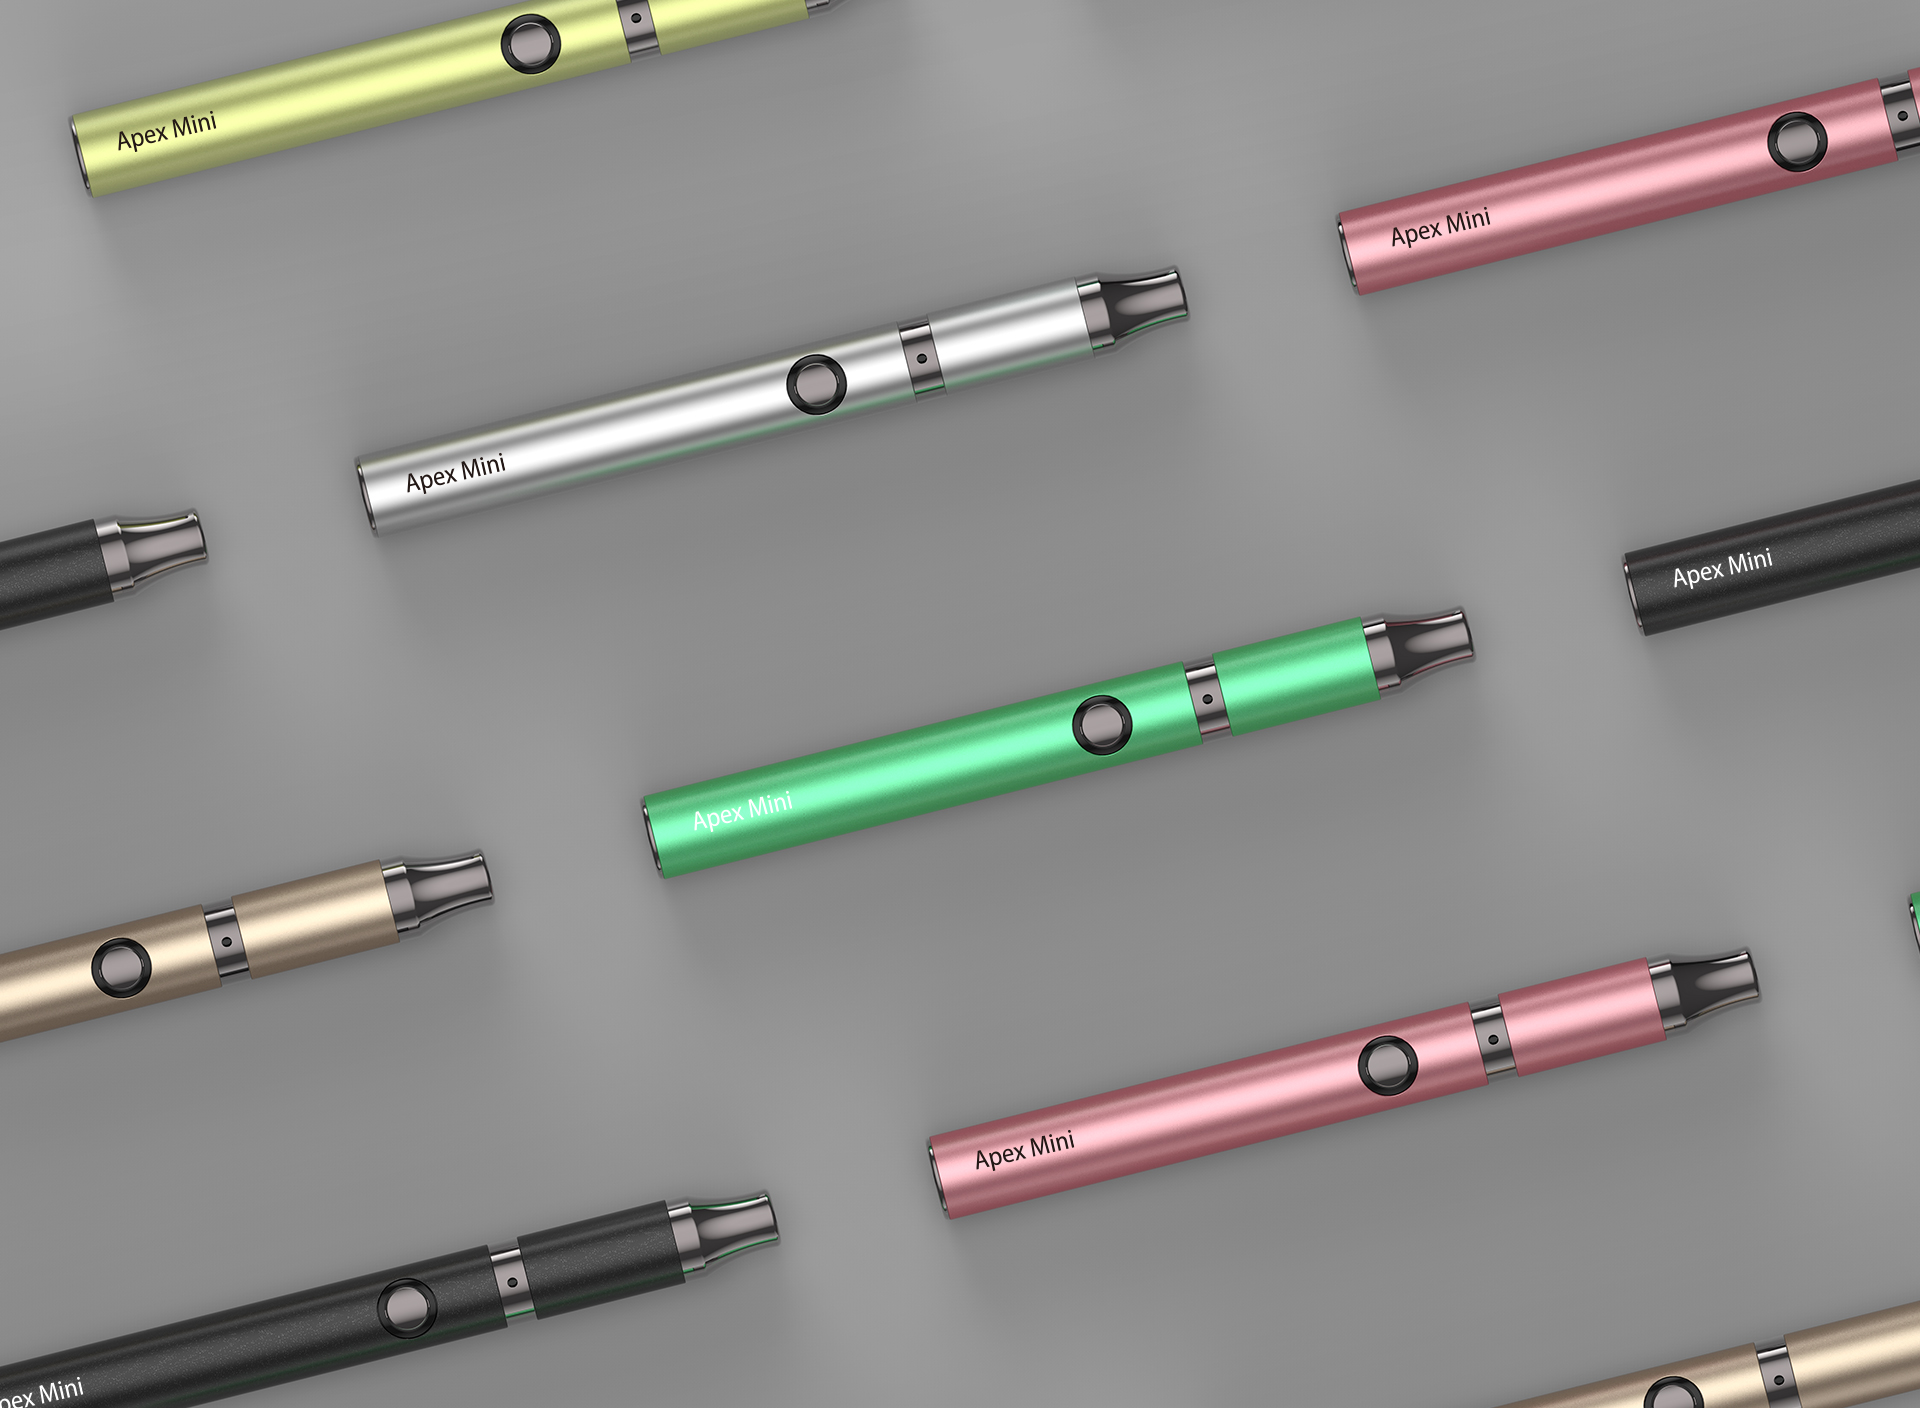 Yocan Apex Mini vape pen is discreet yet effective.